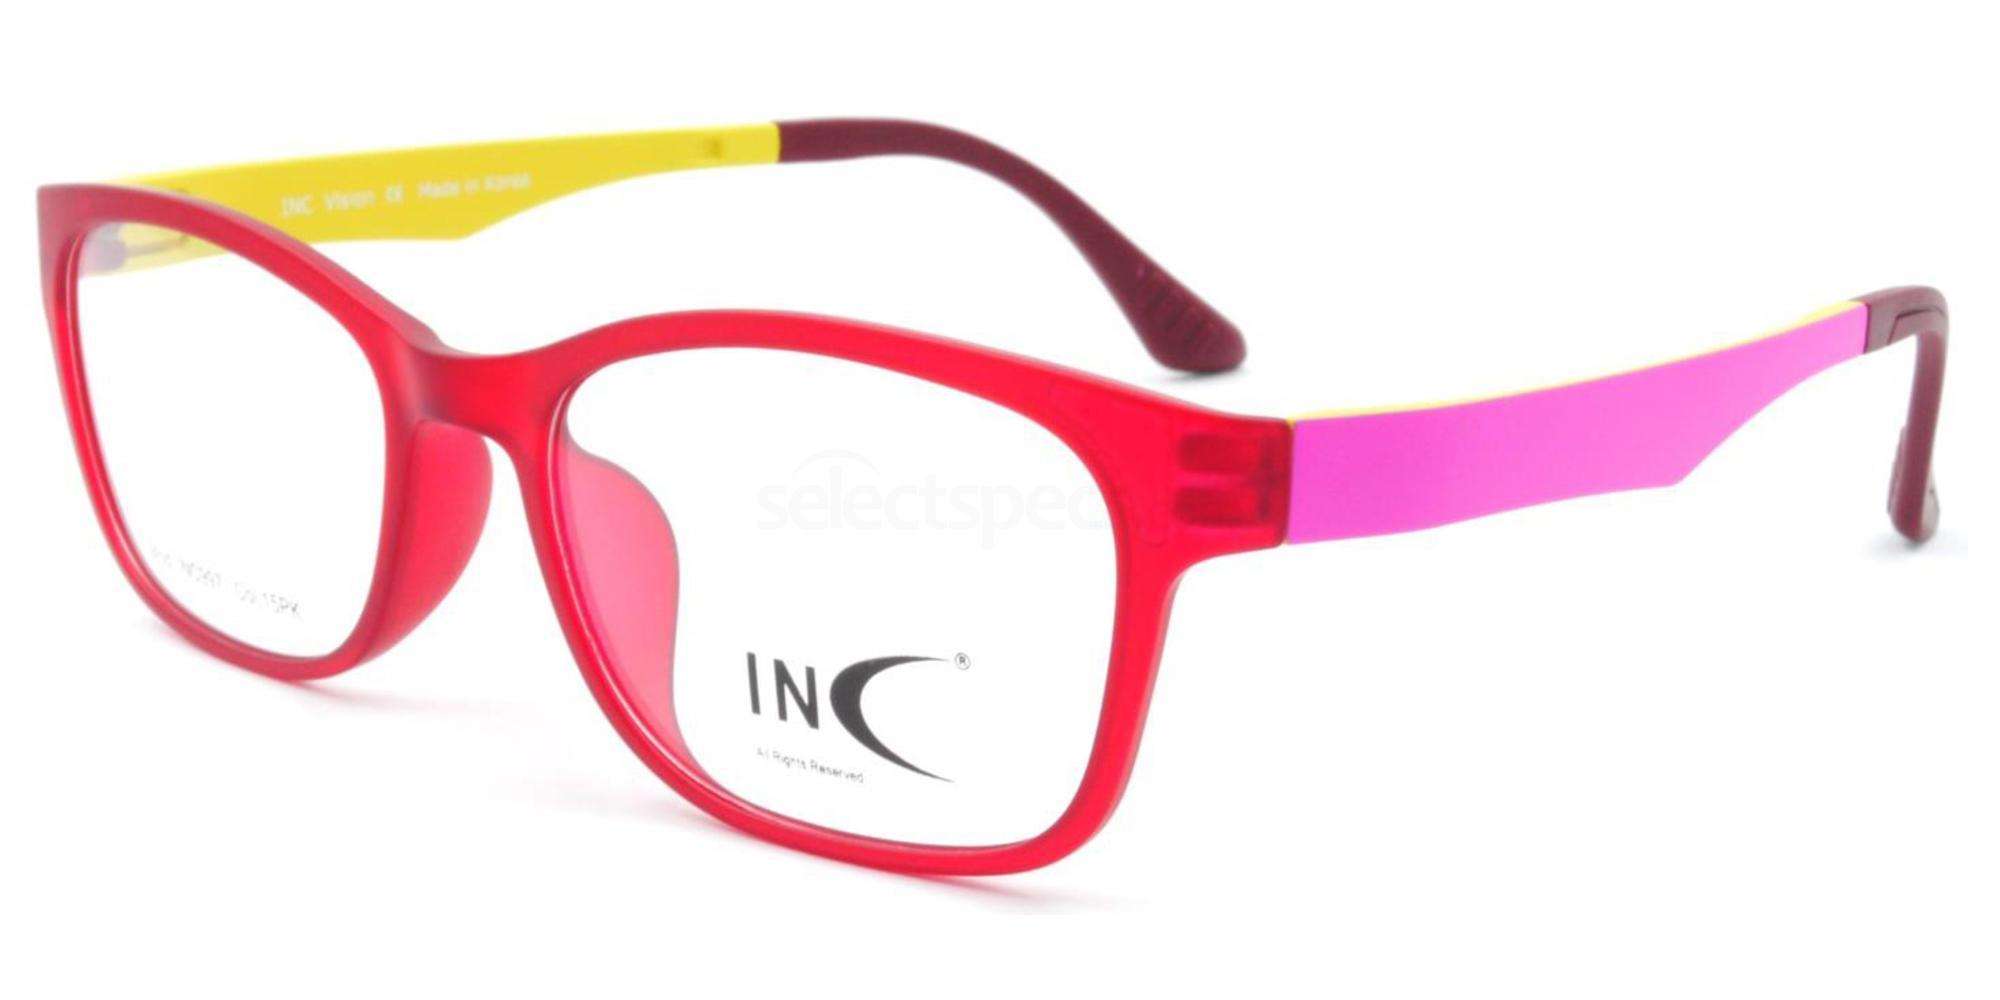 15PK INC 997 Glasses, INC Vision